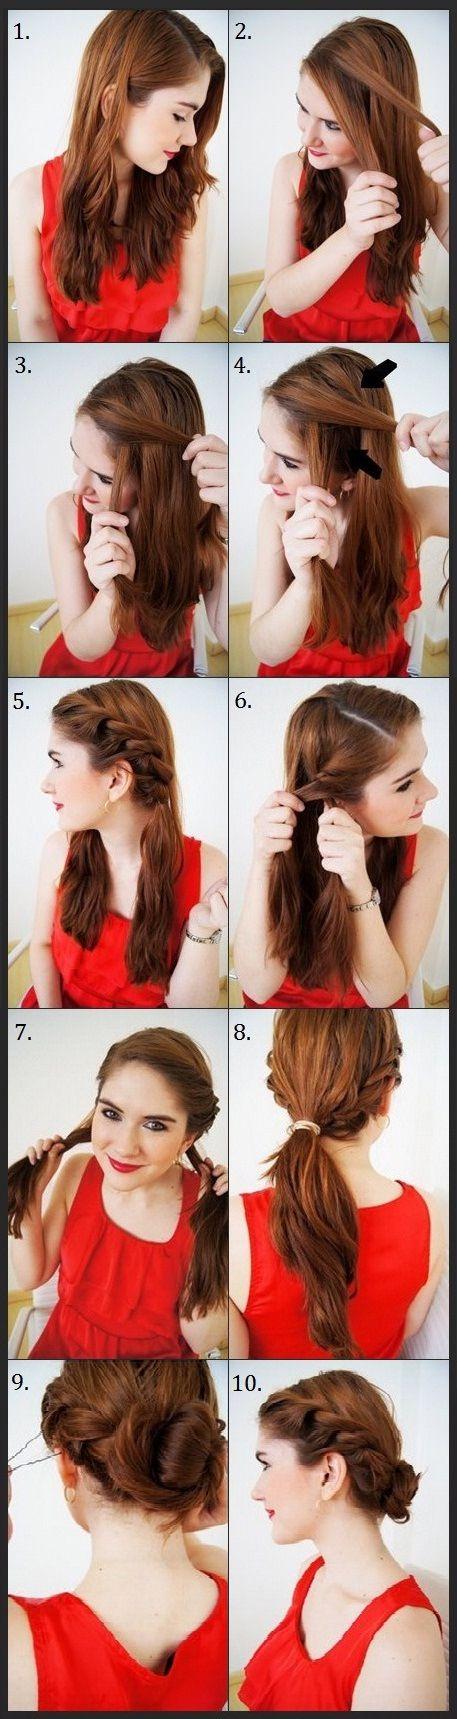 Creative Summer Hair Up Do